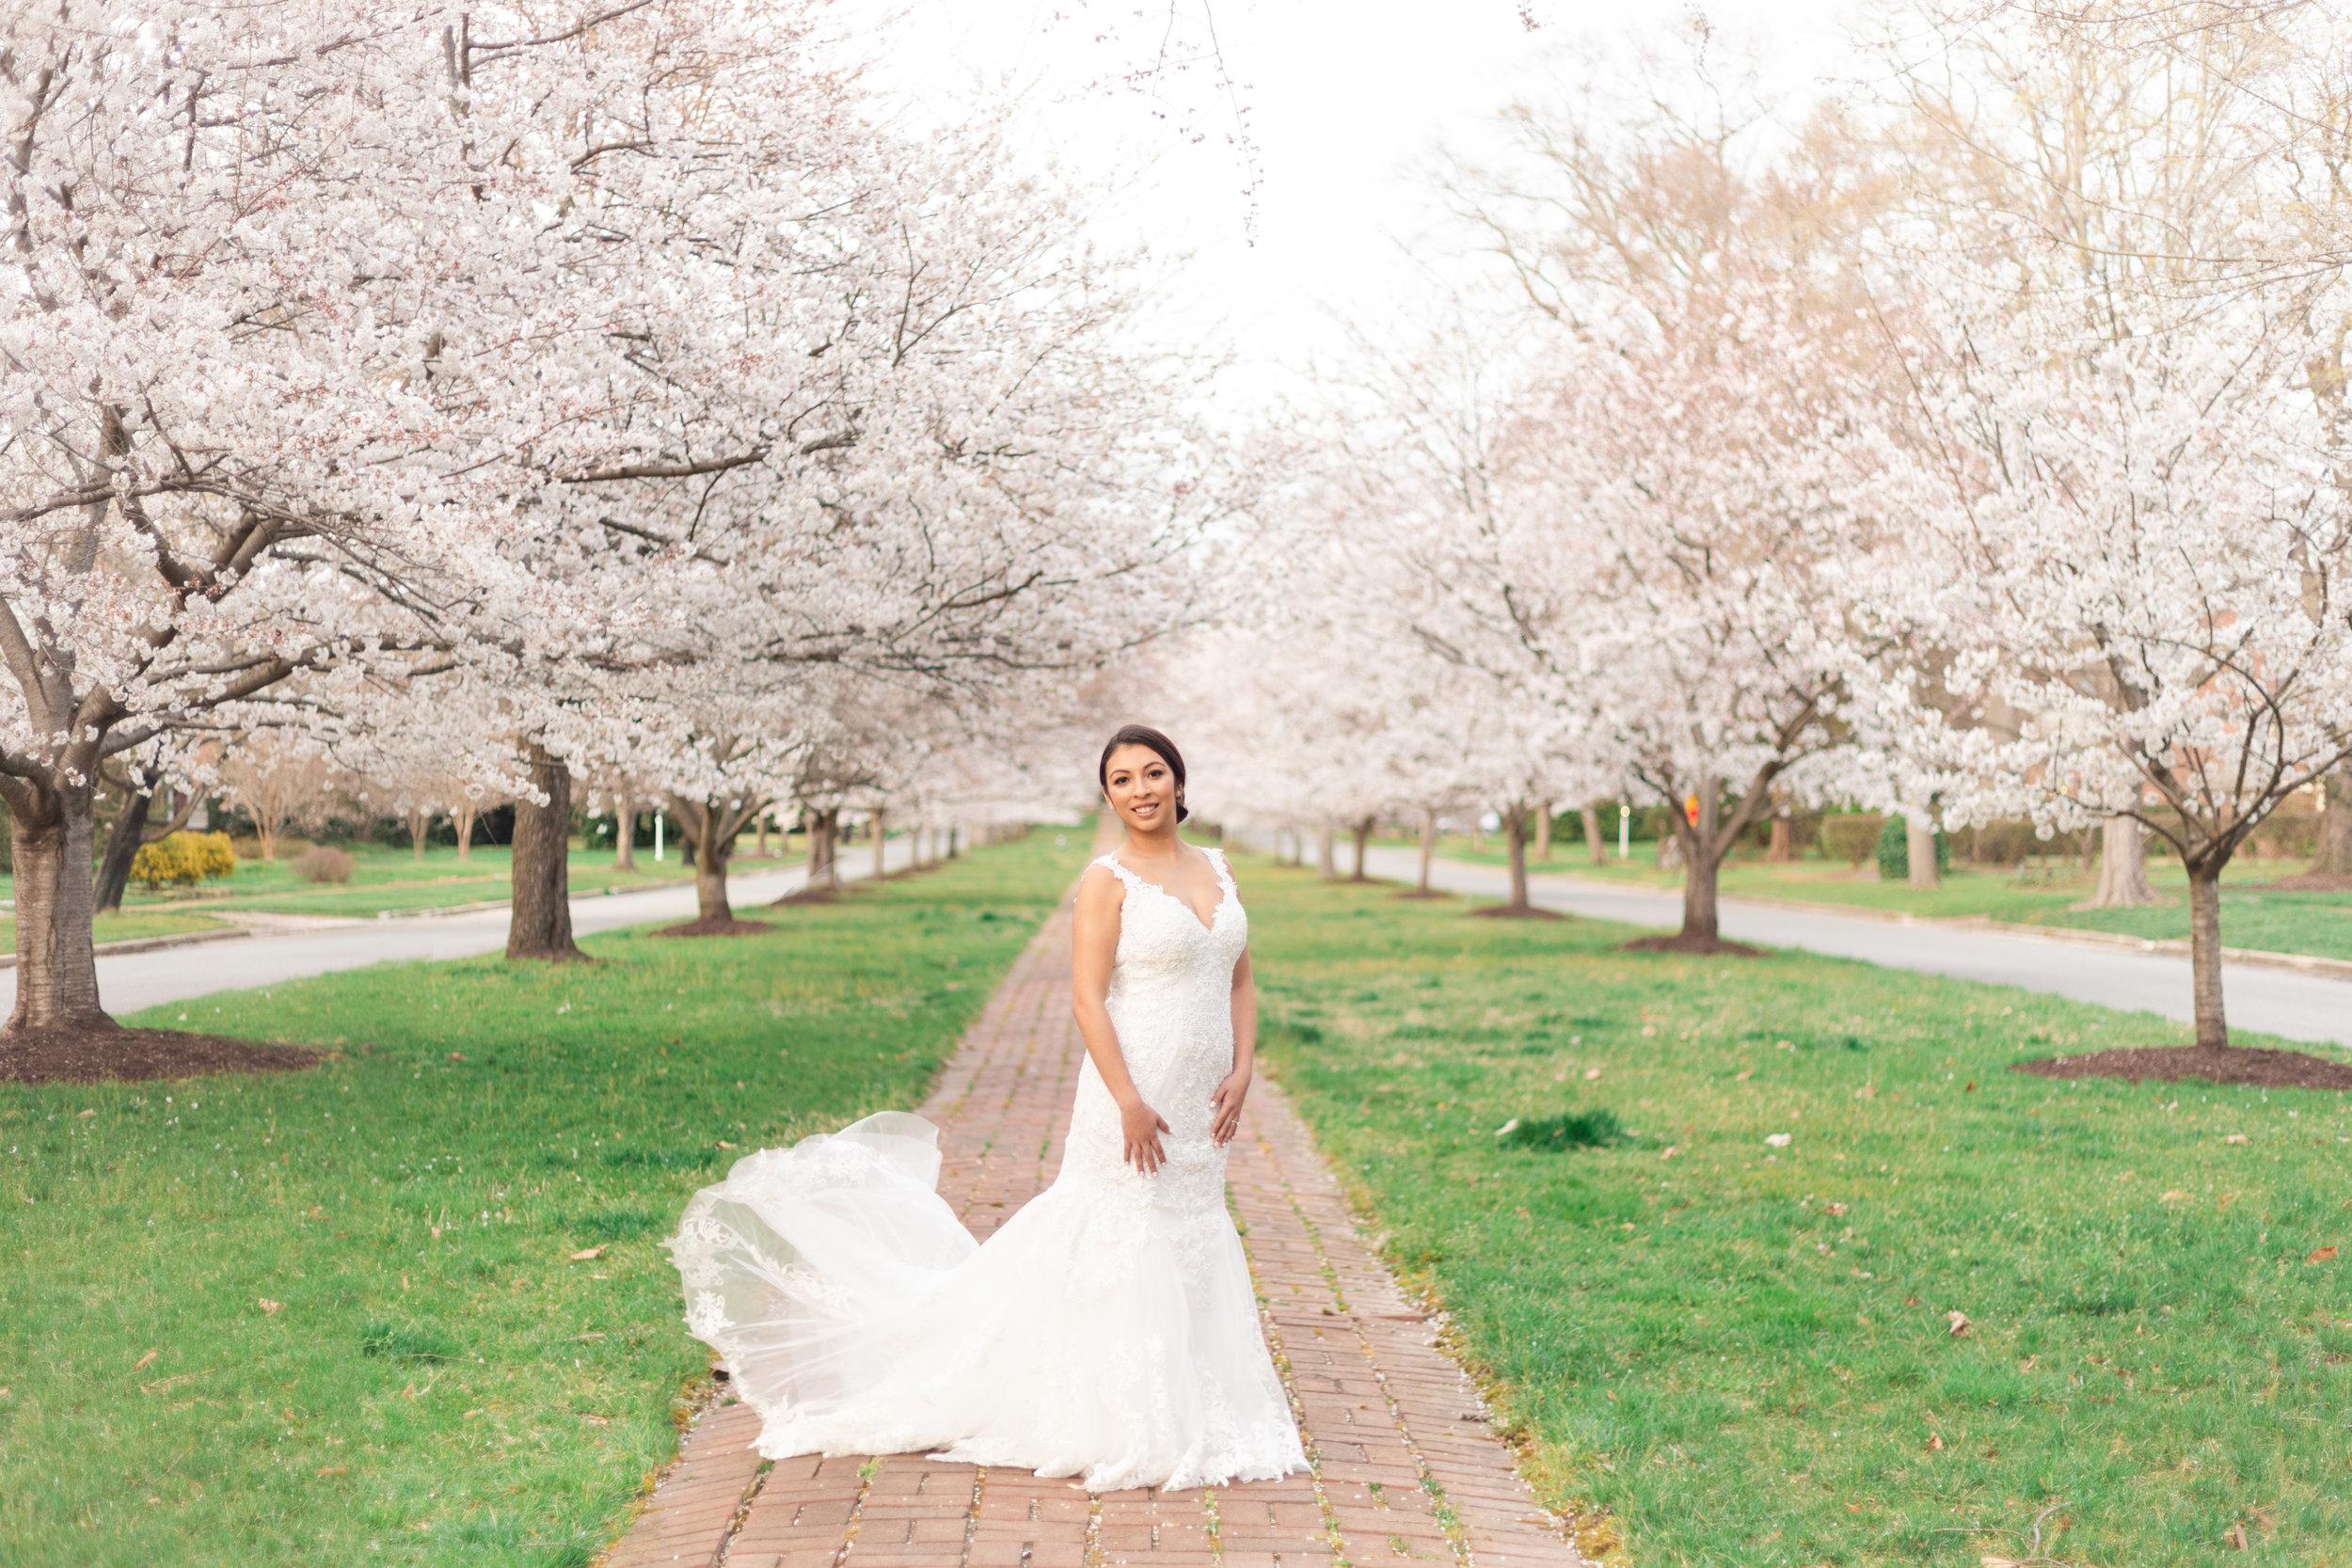 MJ Mendoza Photography - Richmond VA Cherry Blossom Bridal Session